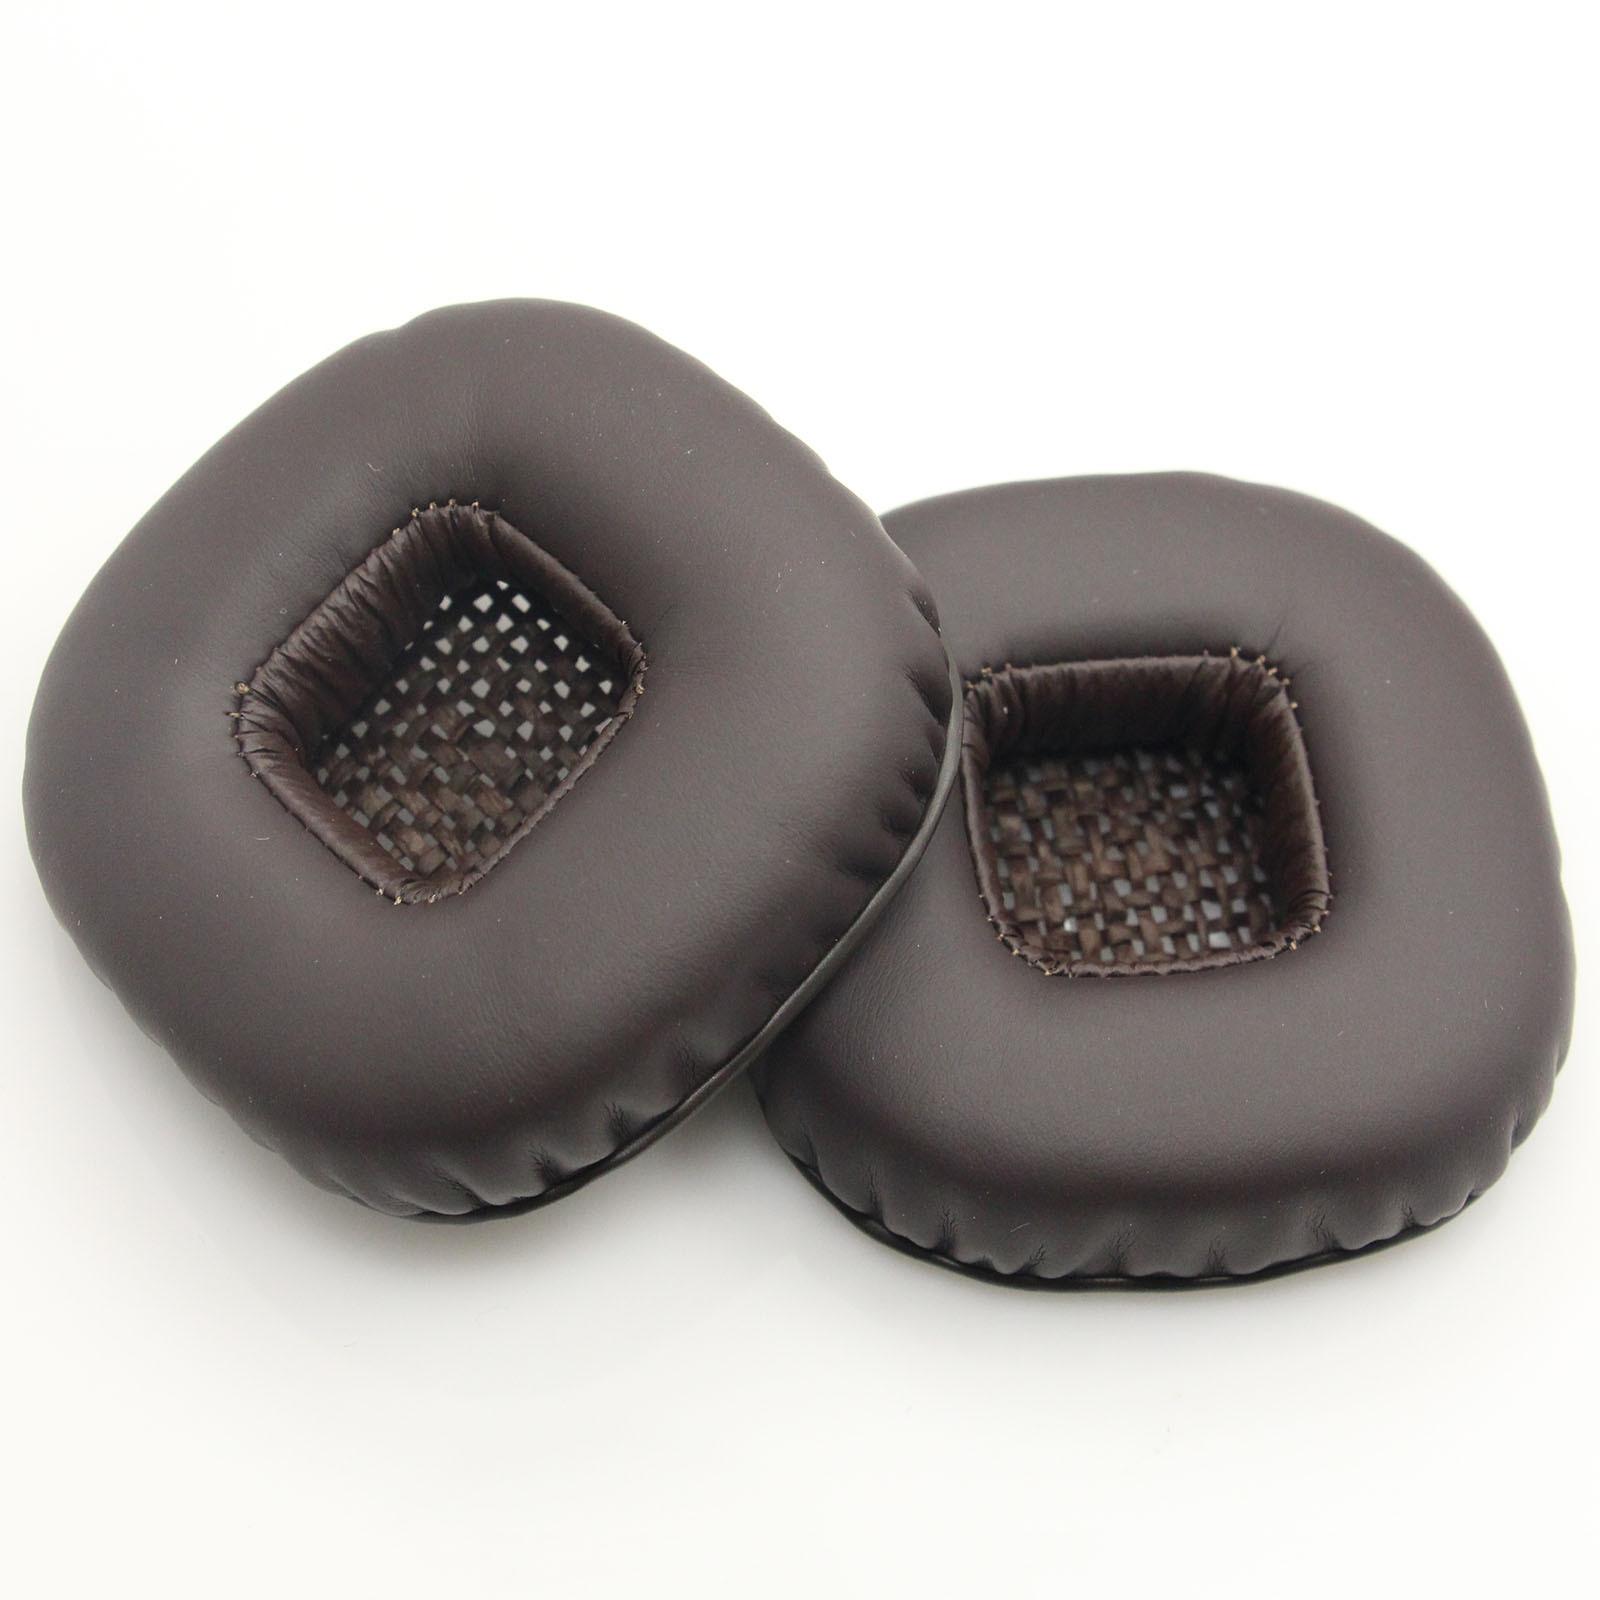 Replacement Headphone Ear Pads Soft Sponge Cushion for Marshall Major 1 2 Headphone Accessories Earpads I II Headset brown